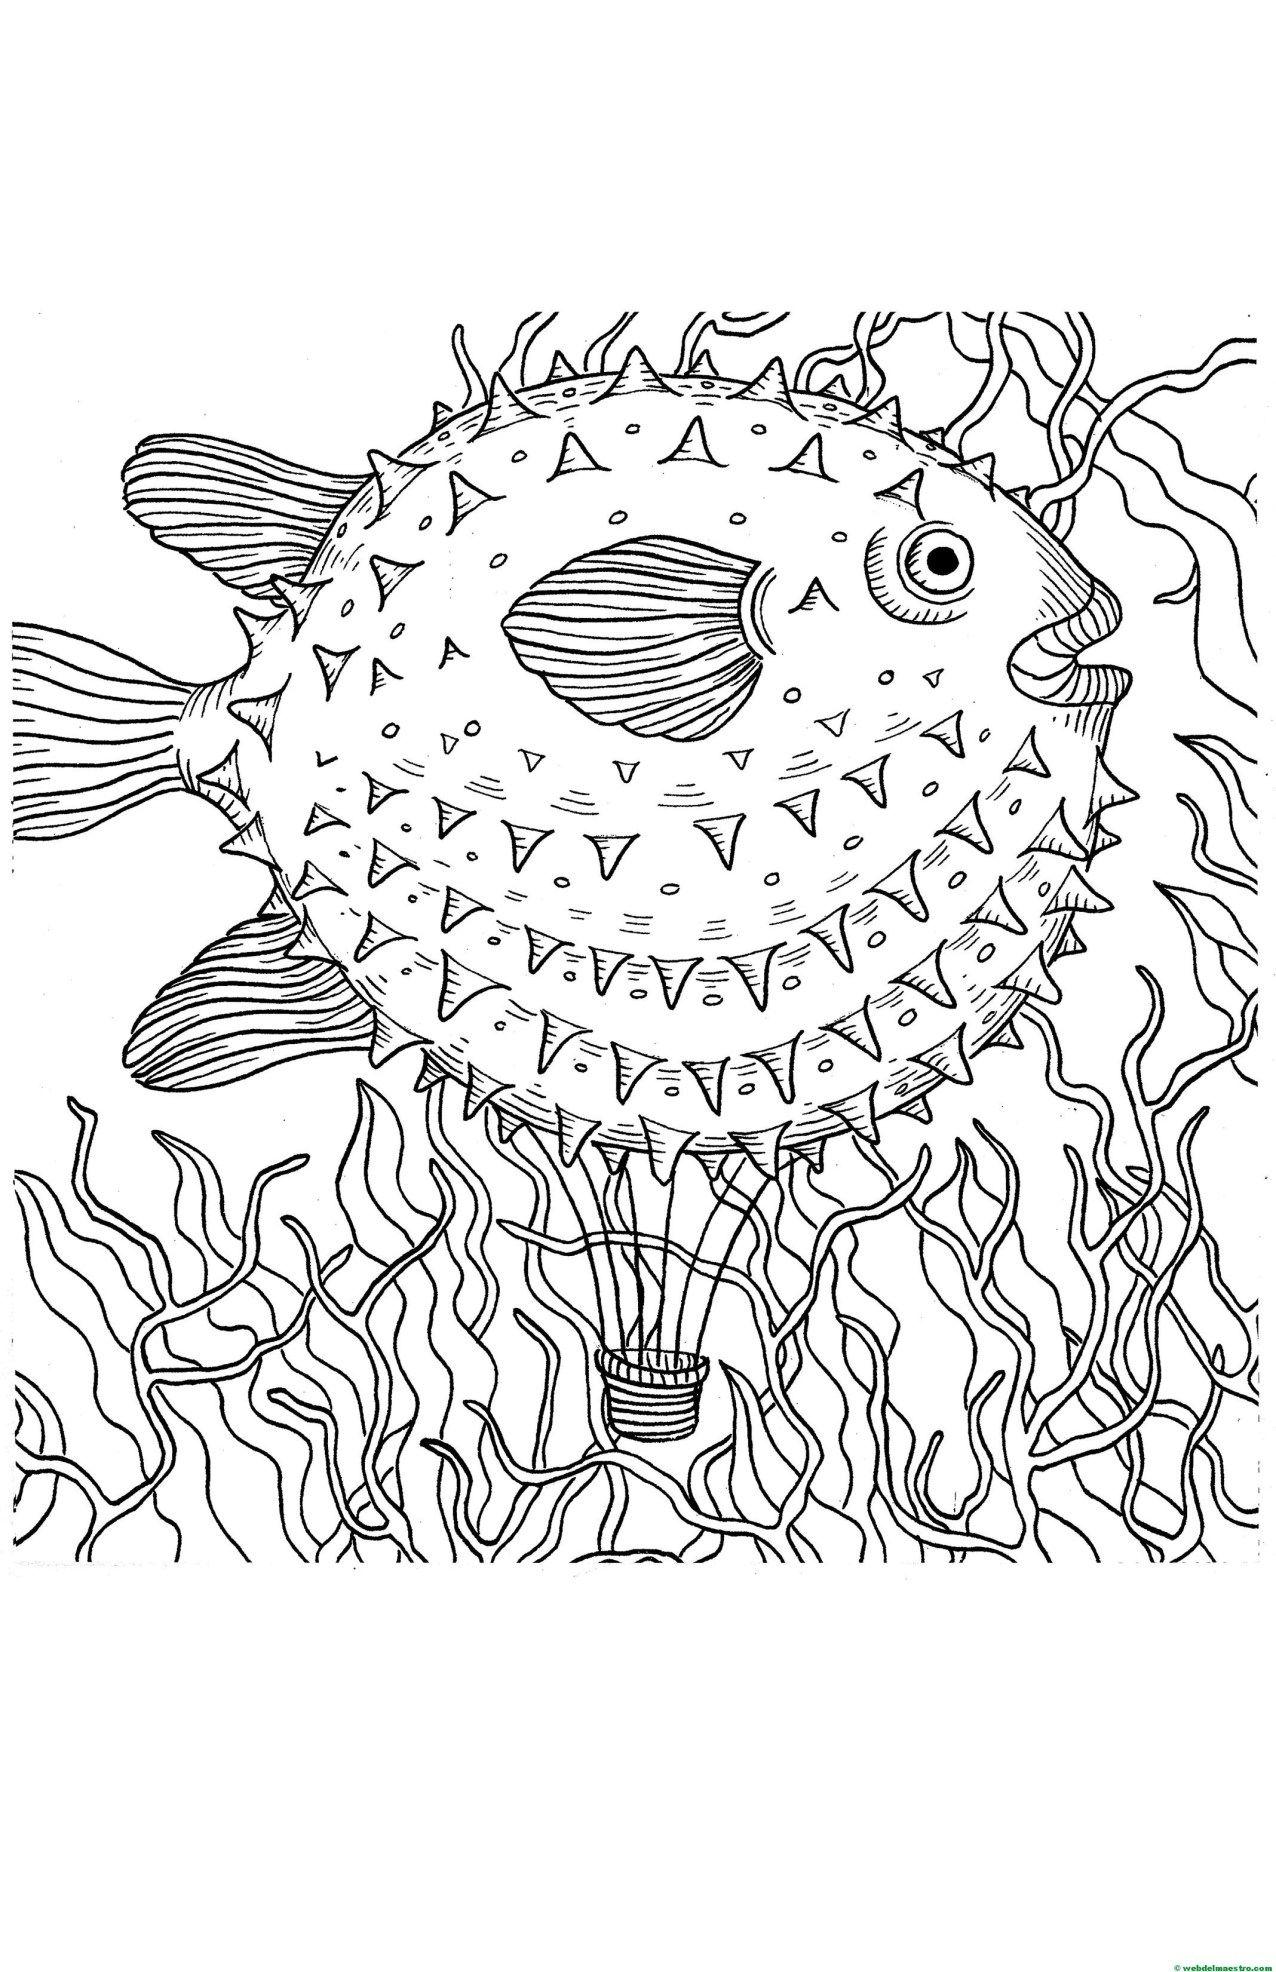 Dibujos antiestrés   Plástica   Pinterest   Pez globo, Dibujos para ...